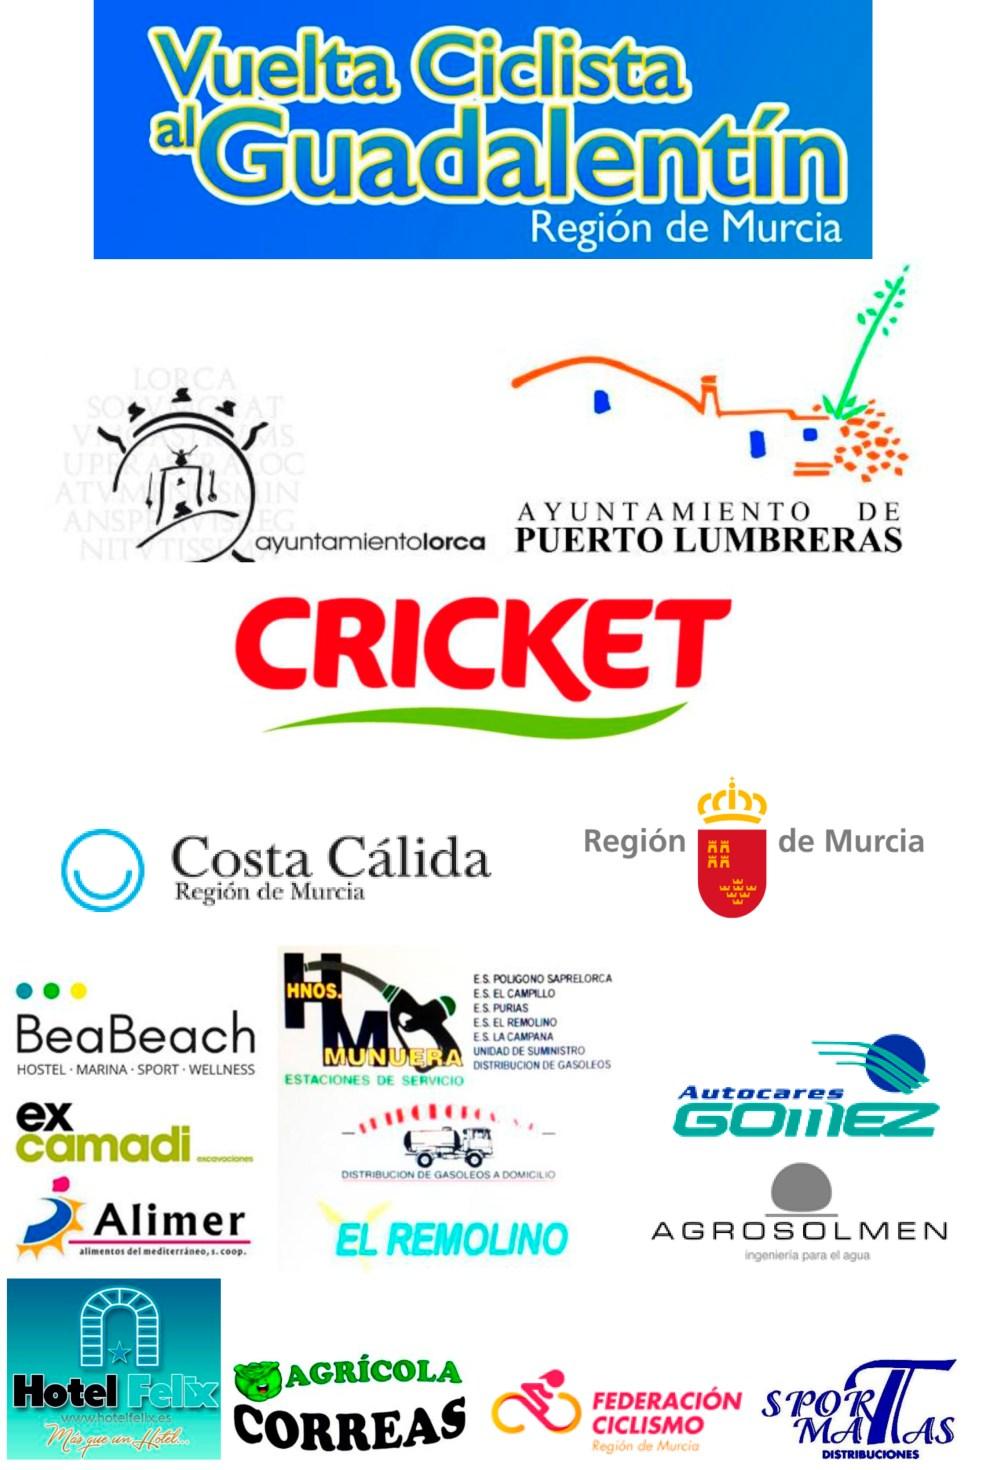 Cartel Vuelta Guadalentín 2019